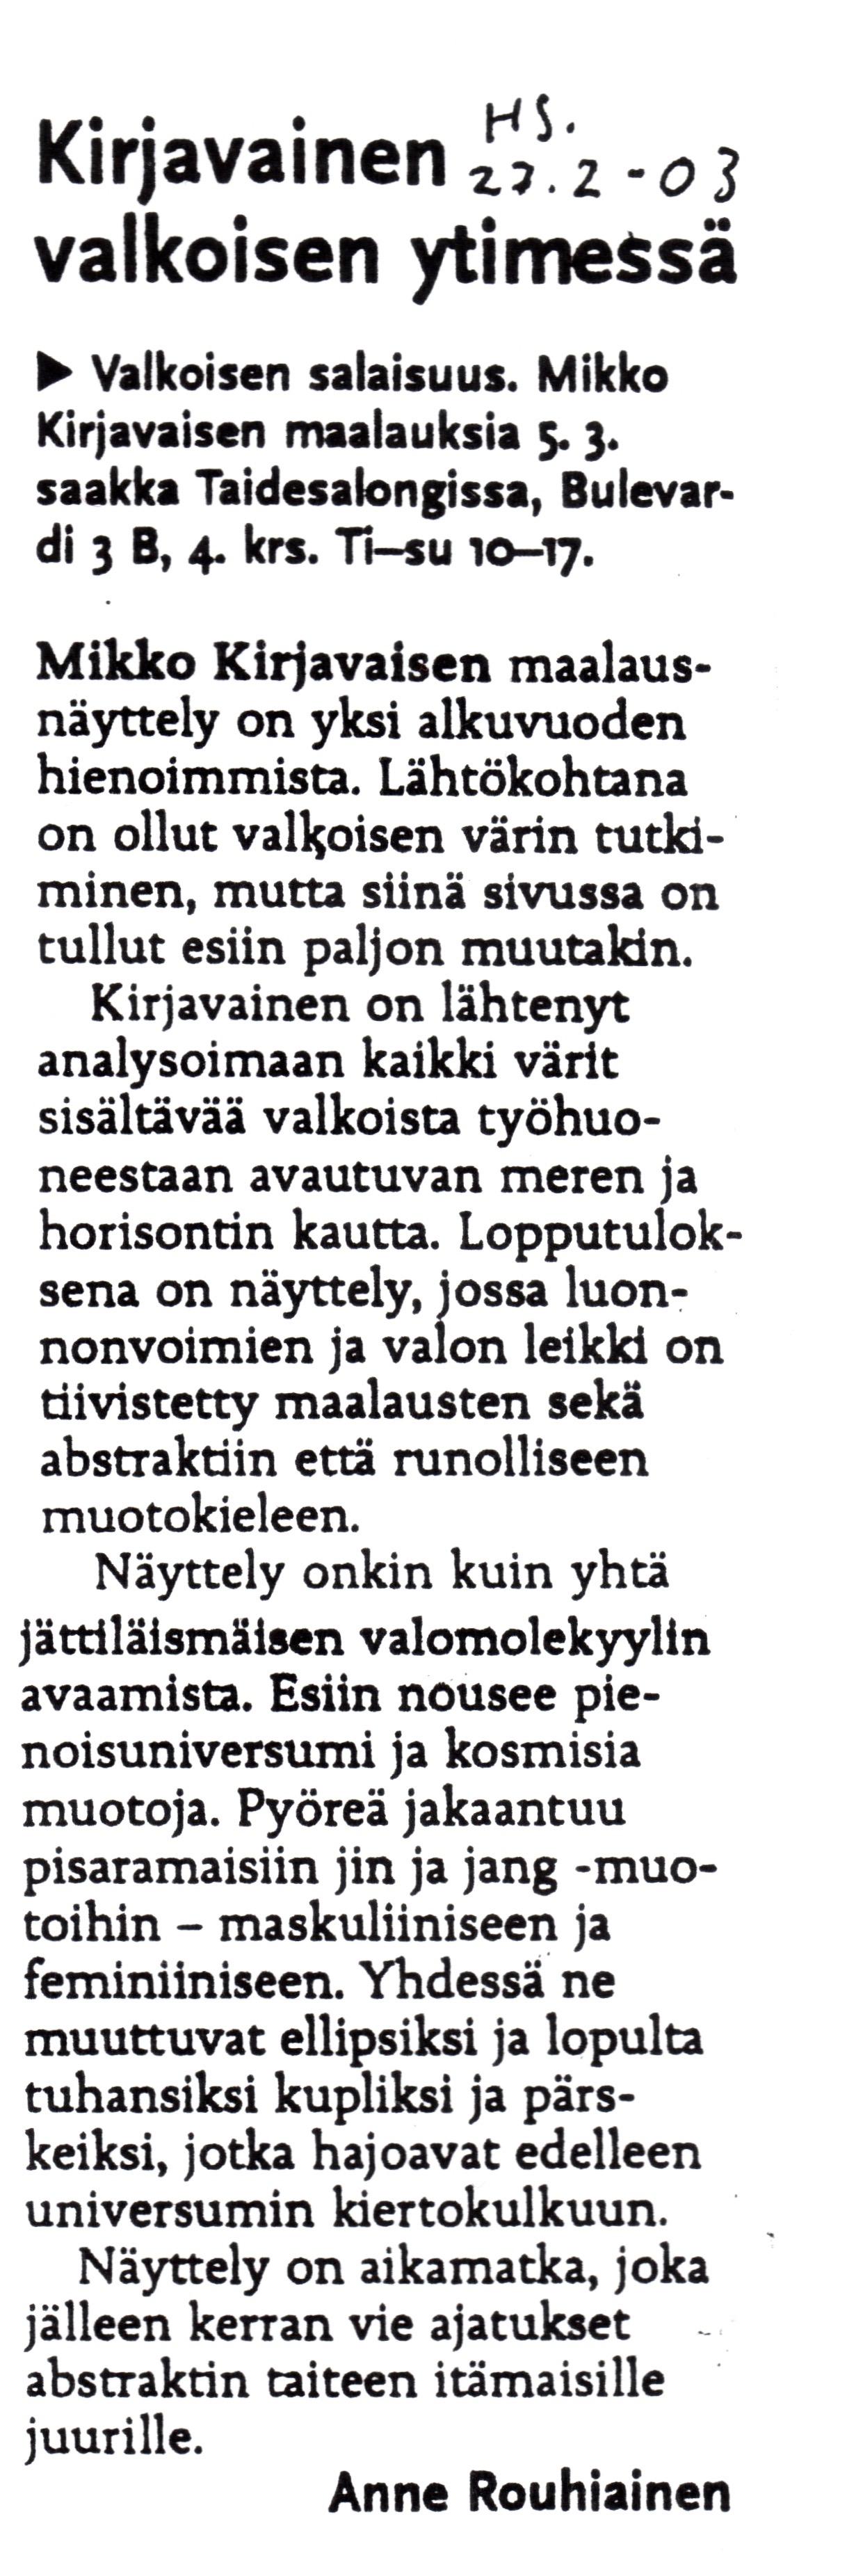 Helsingin Sanomat, Helsinki News